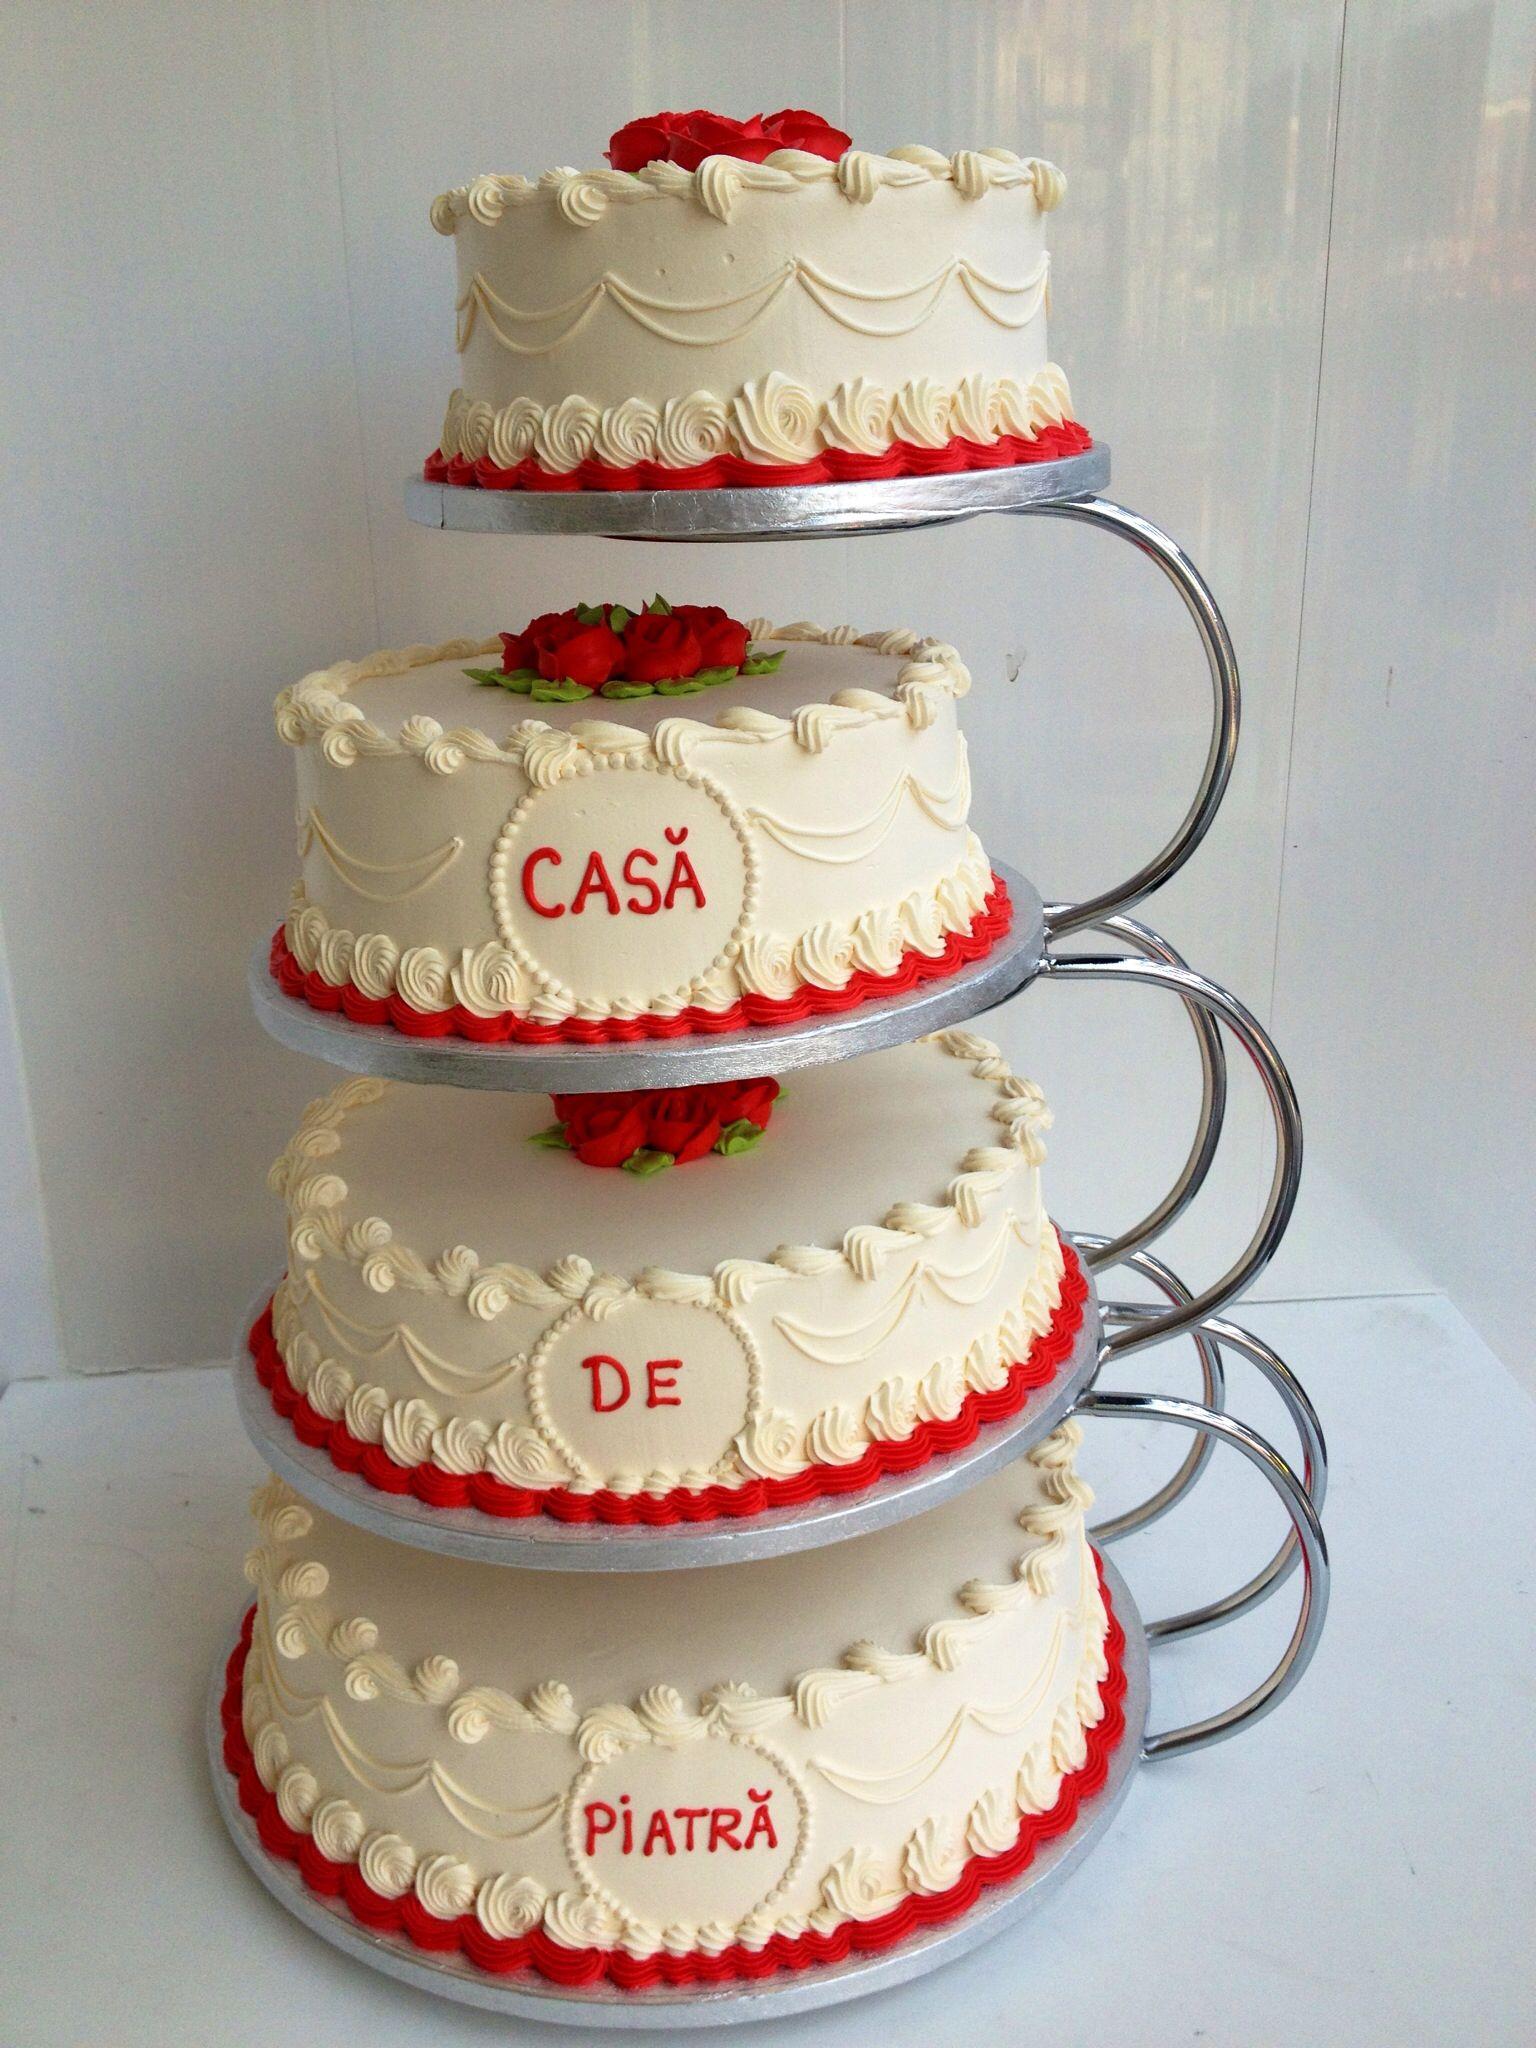 4 Tier Fresh Cream Wedding Cake Wedding Cakes Cream Wedding